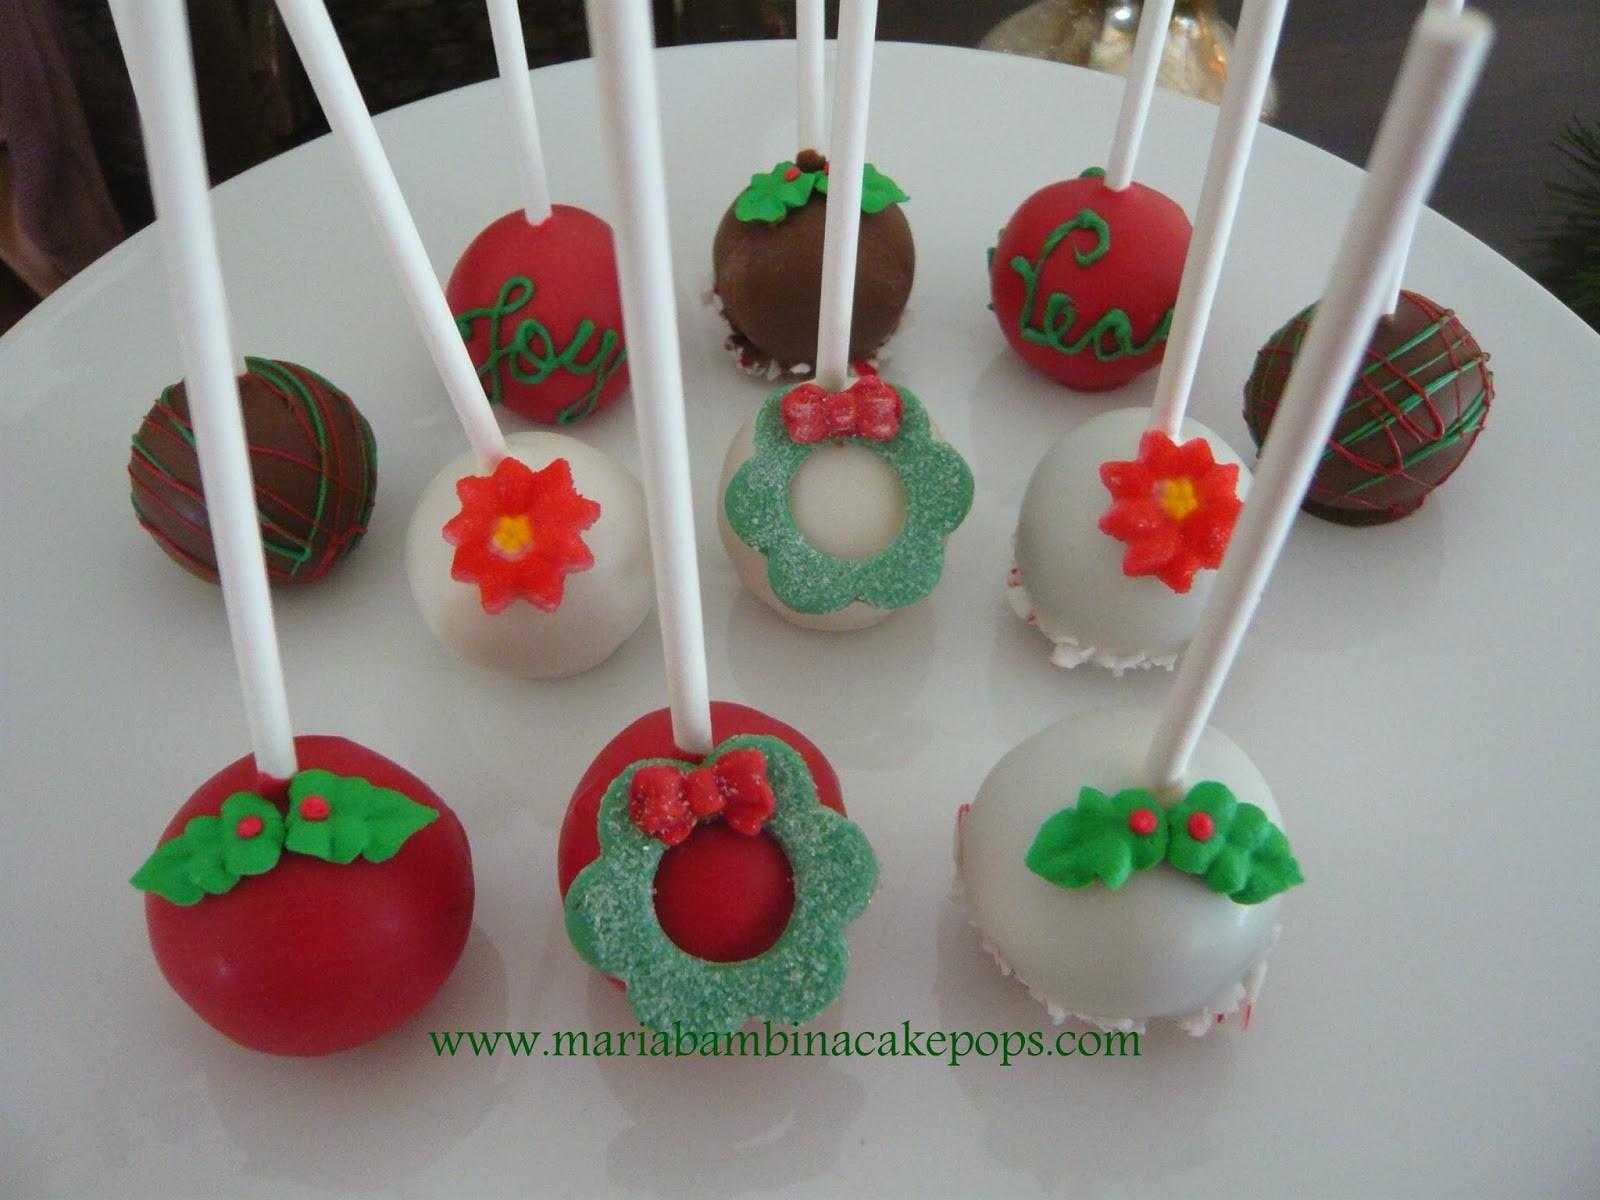 Christmas Cakes Flavors  Maria Bambina cake pops and more Seasonal Flavors